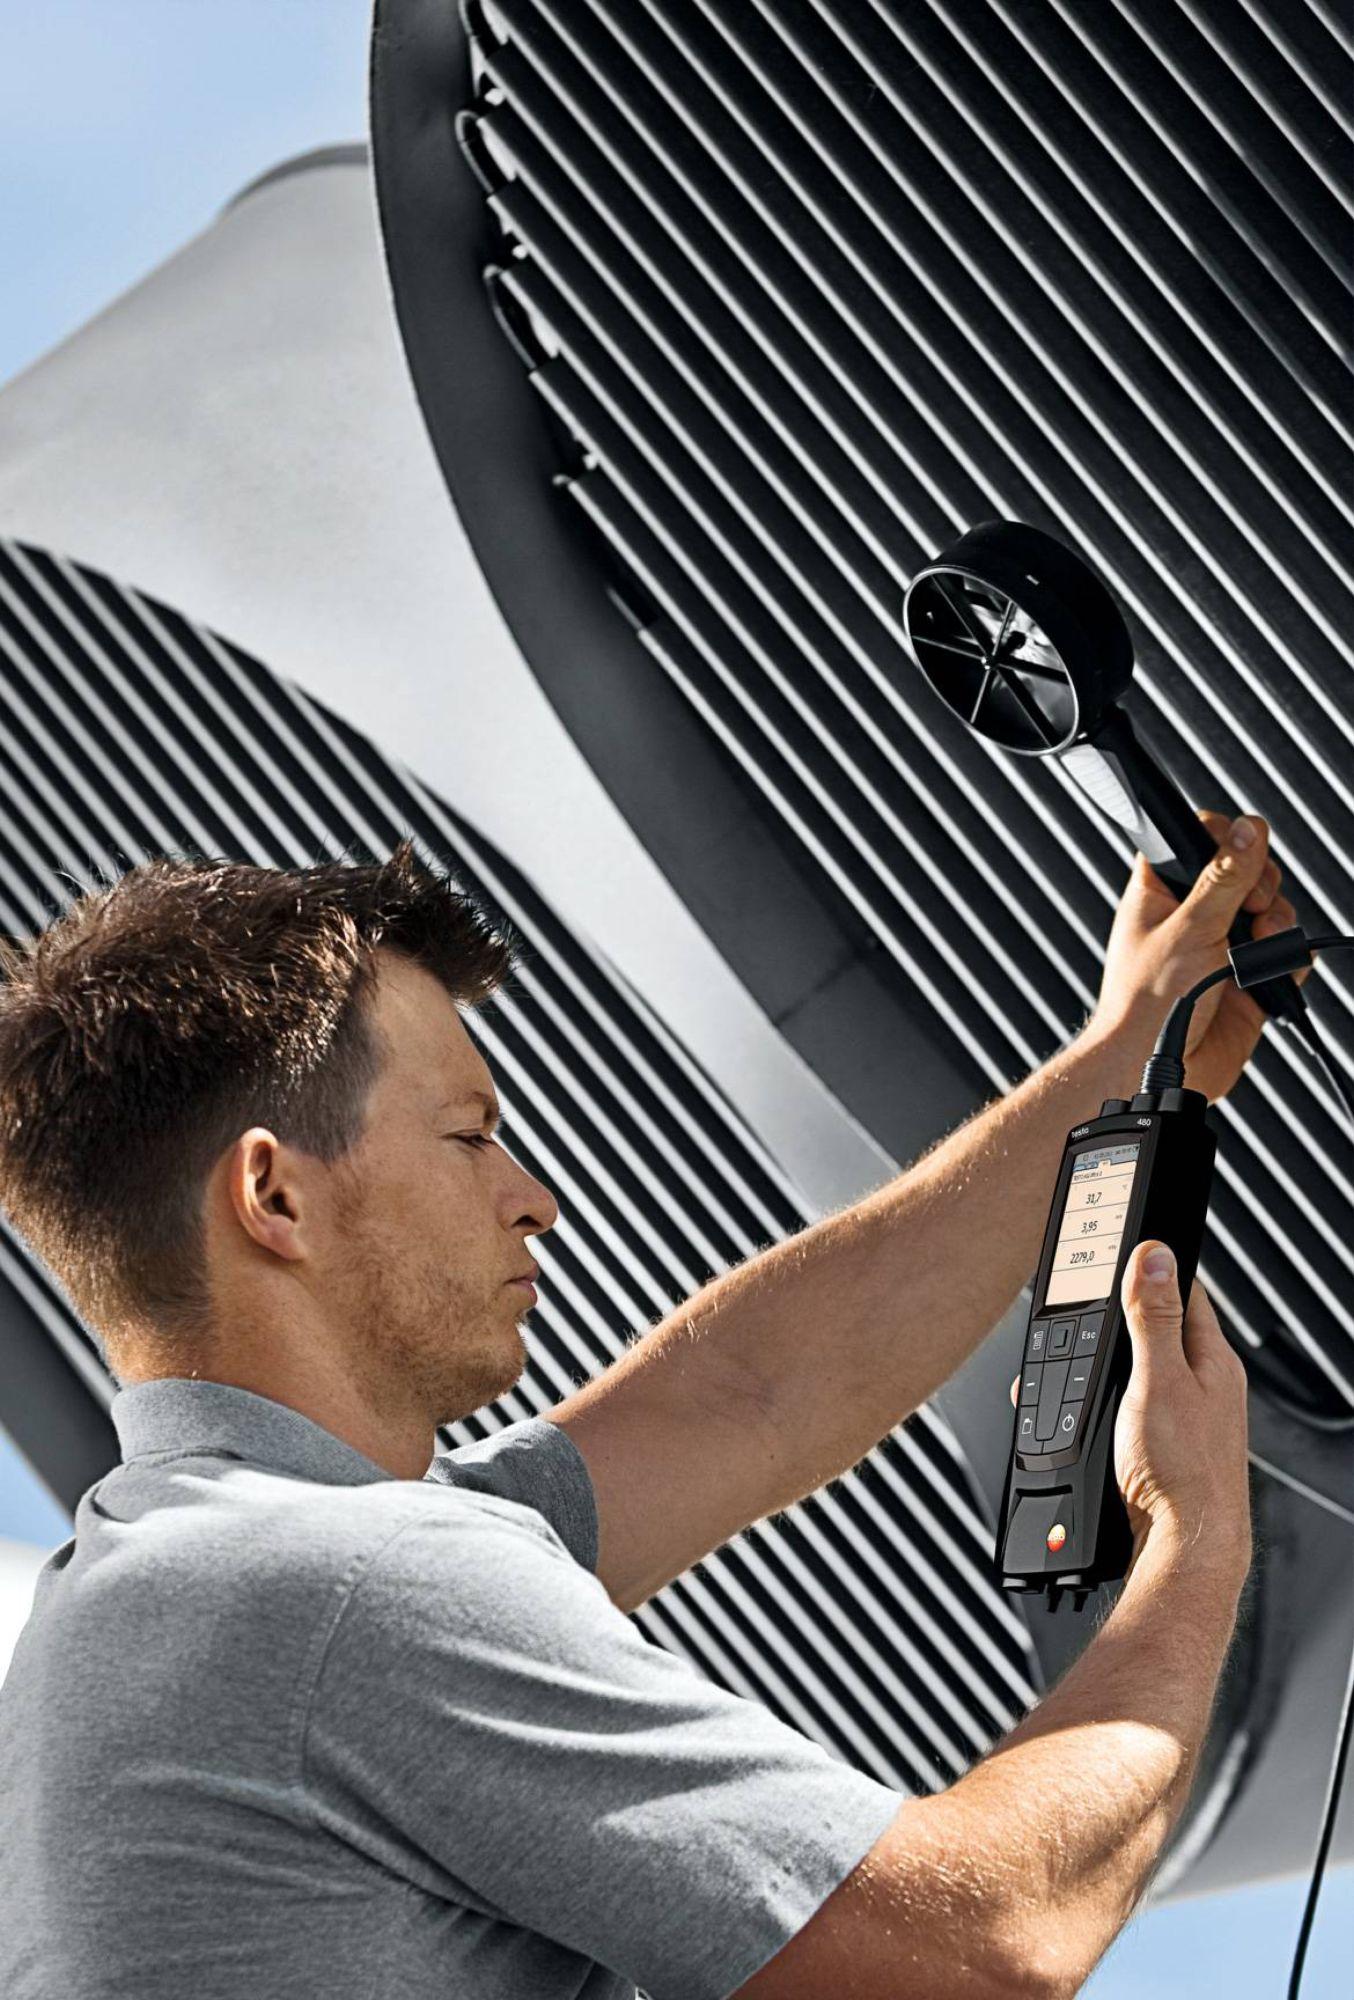 testo多功能测量仪通风空调系统